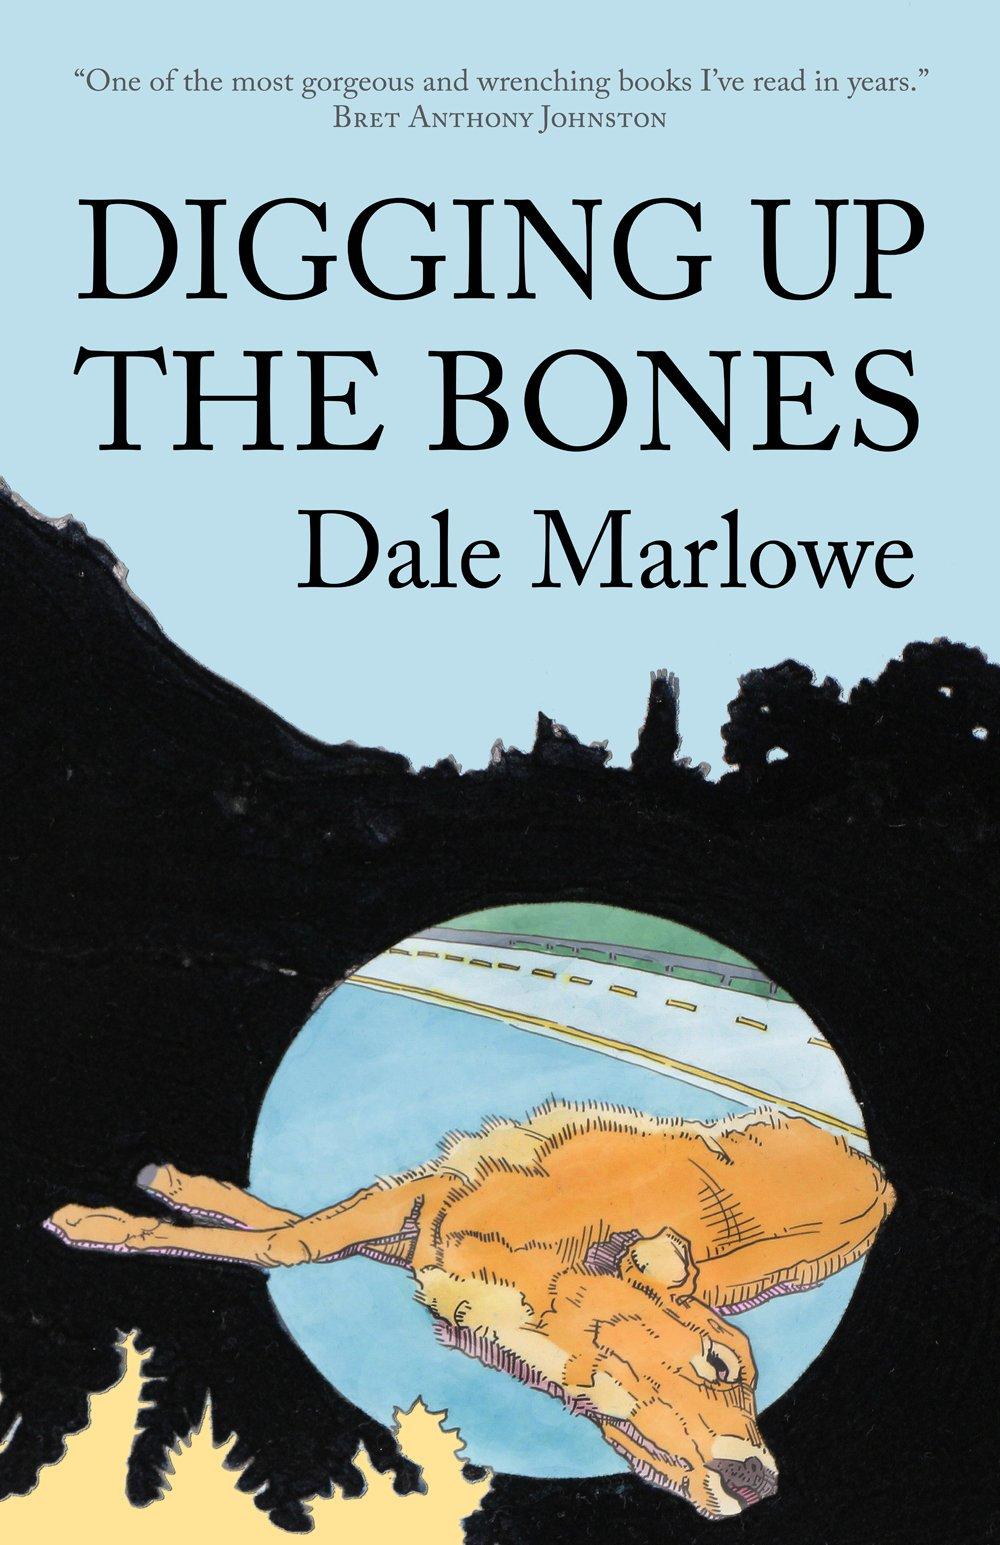 Digging Up The Bones